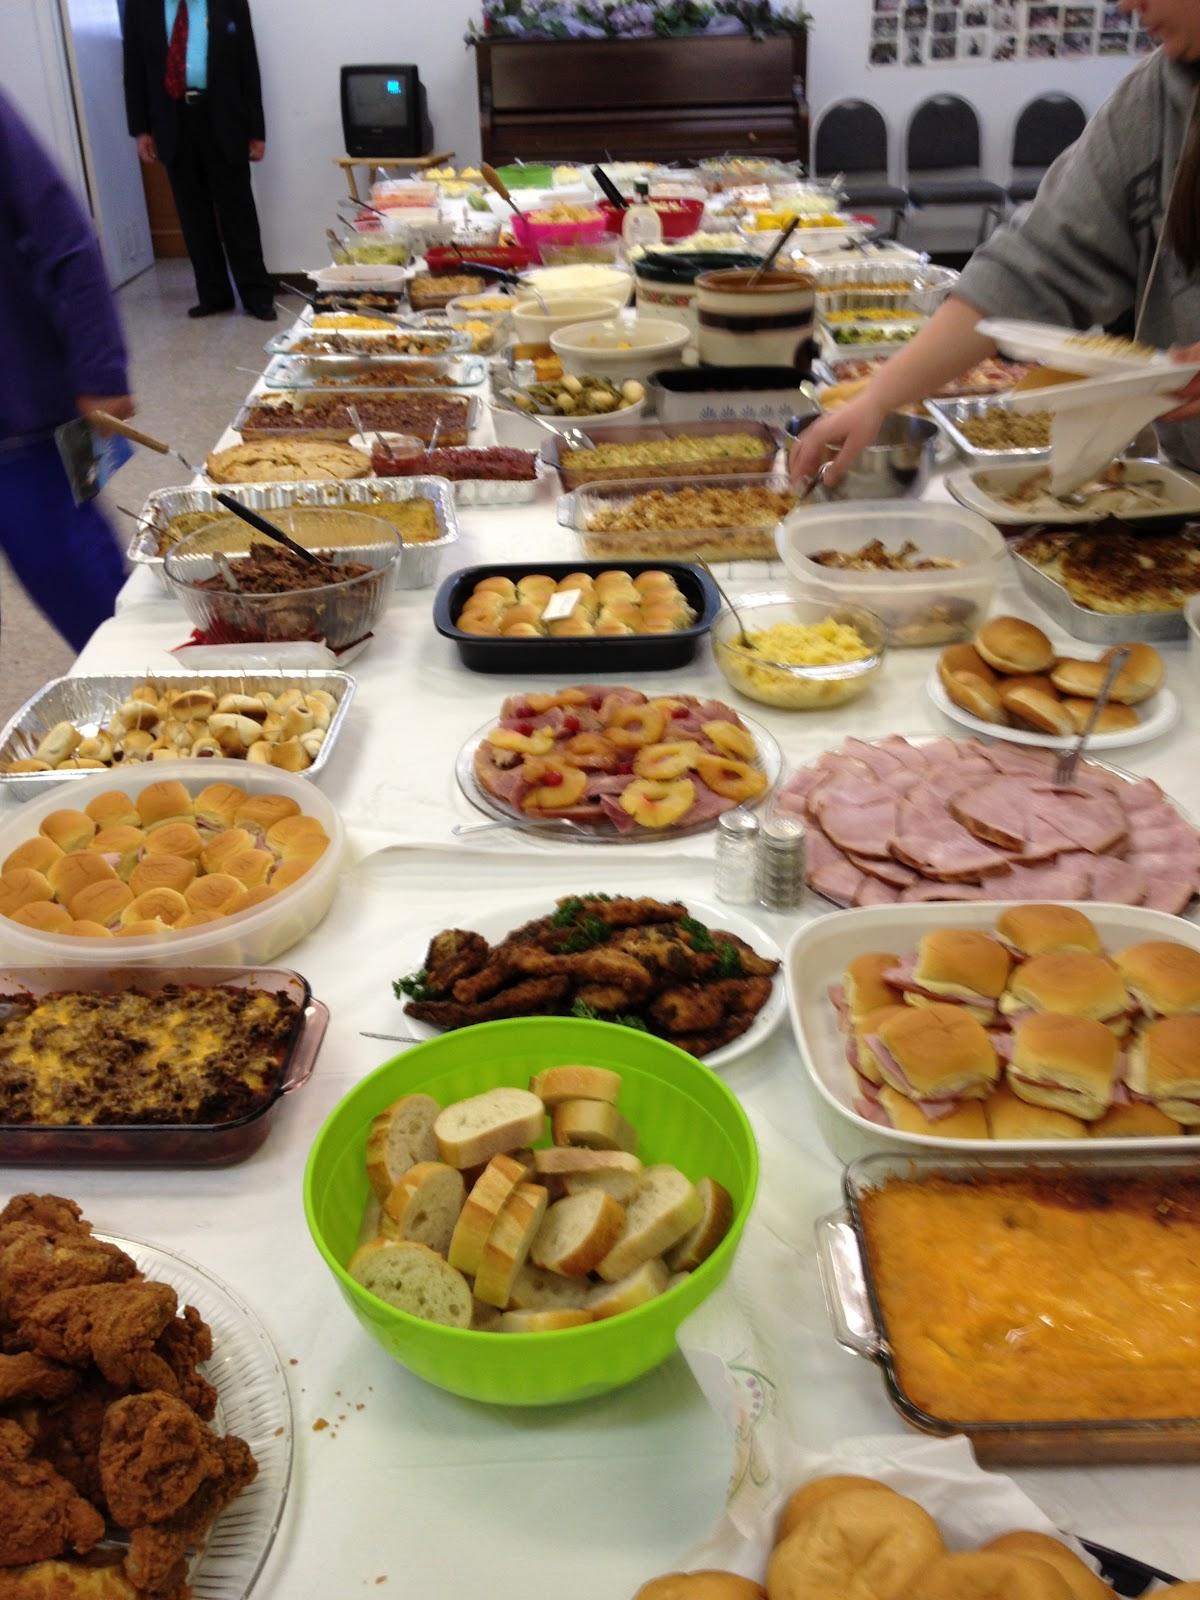 Classroom Potluck Ideas : Fatback and foie gras april